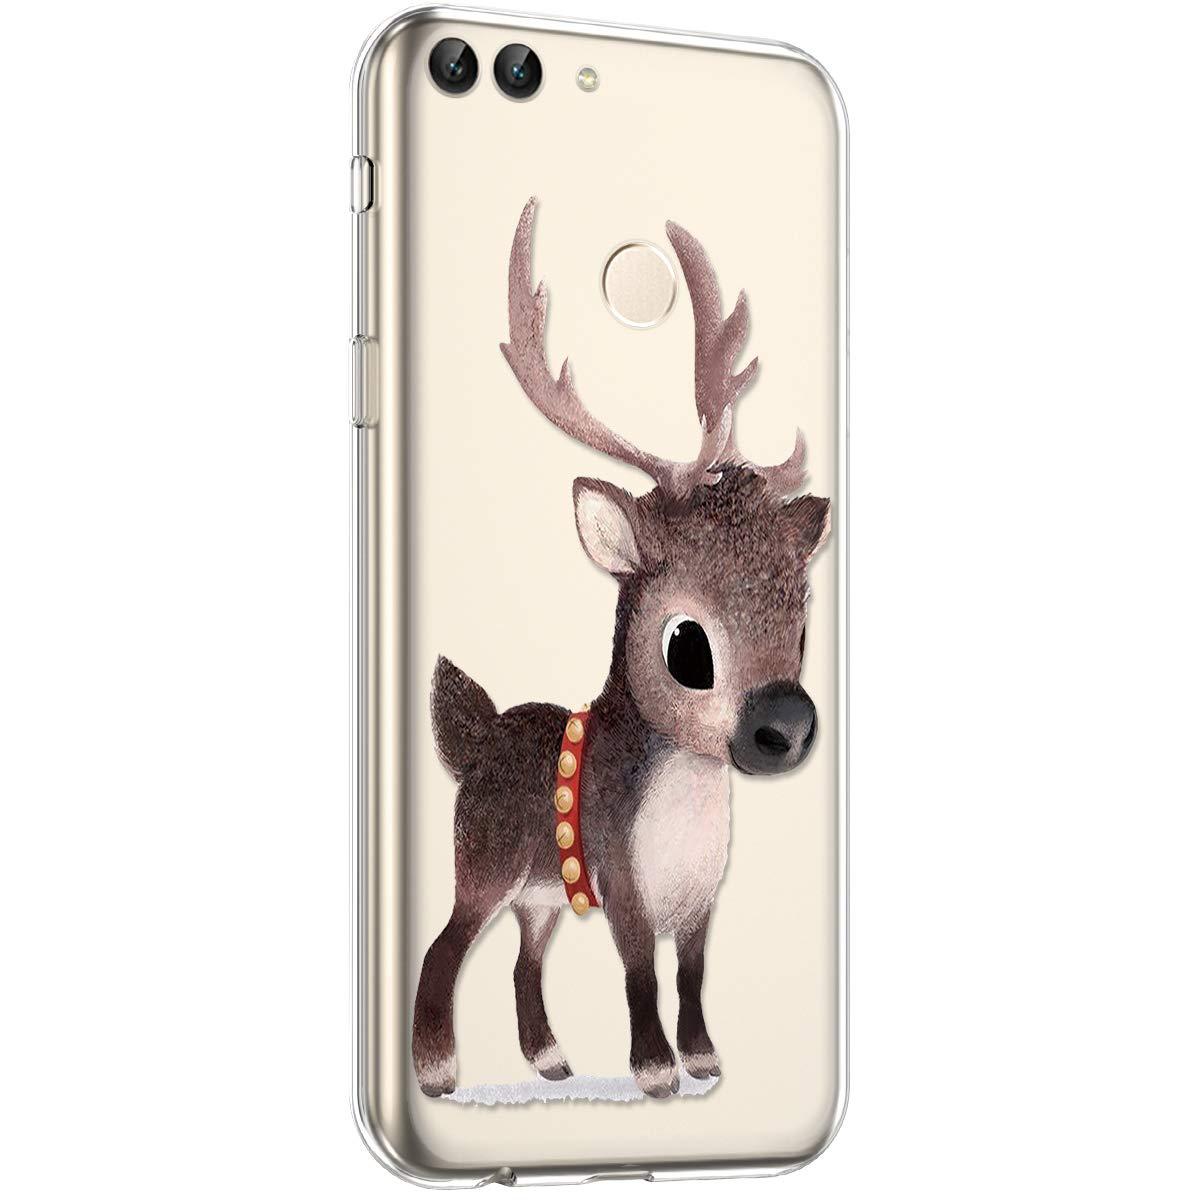 Surakey Silikon H/ülle f/ür Huawei P Smart H/ülle,Xmas Christmas Weihnachten Schneeflocke Muster Ultra D/ünn Durchsichtig TPU Silikon Handyh/ülle Schutzh/ülle Case Cover f/ür Huawei P Smart